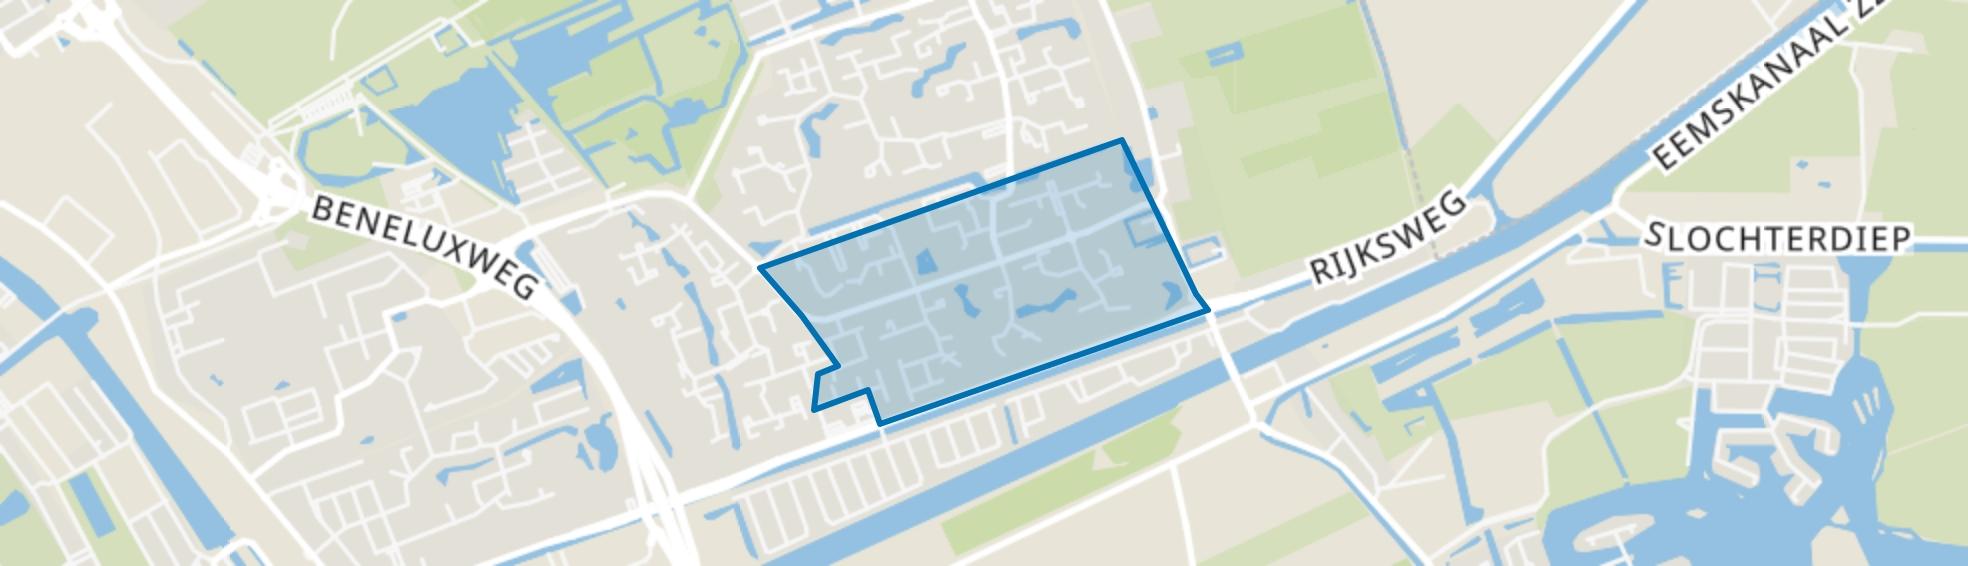 Lewenborg-Zuid, Groningen map